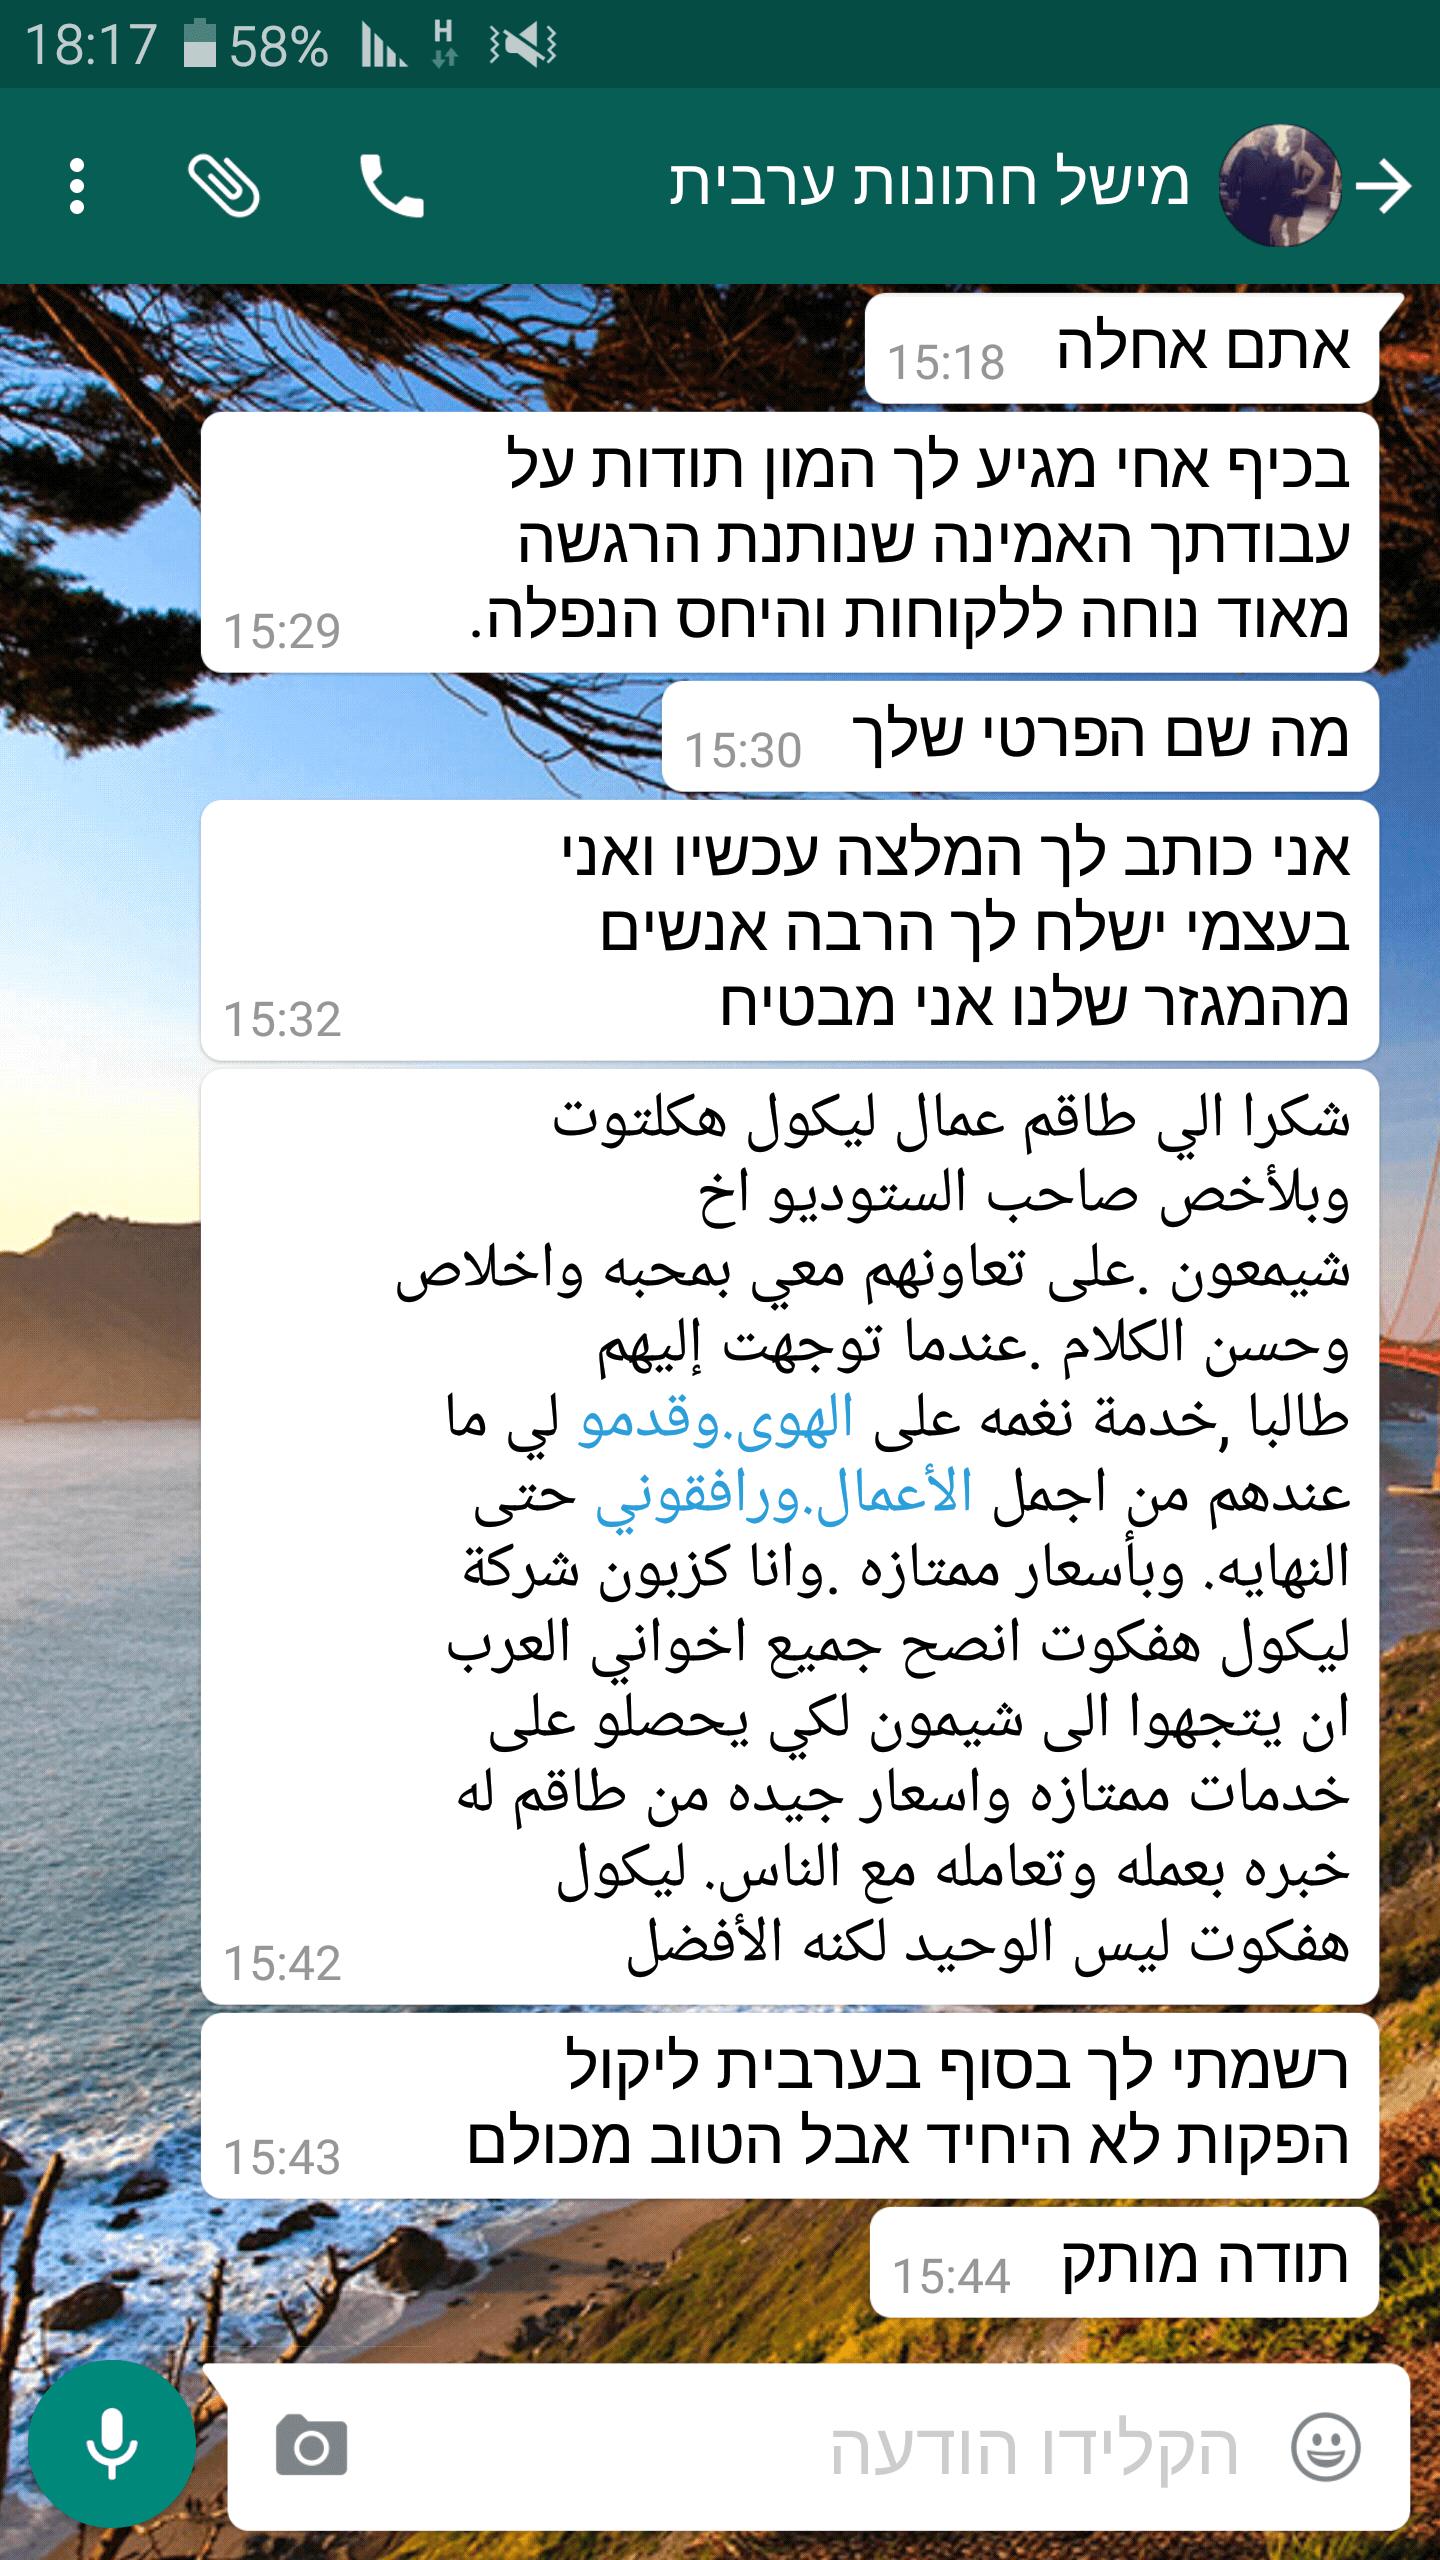 Screenshot_2015-09-21-18-17-34